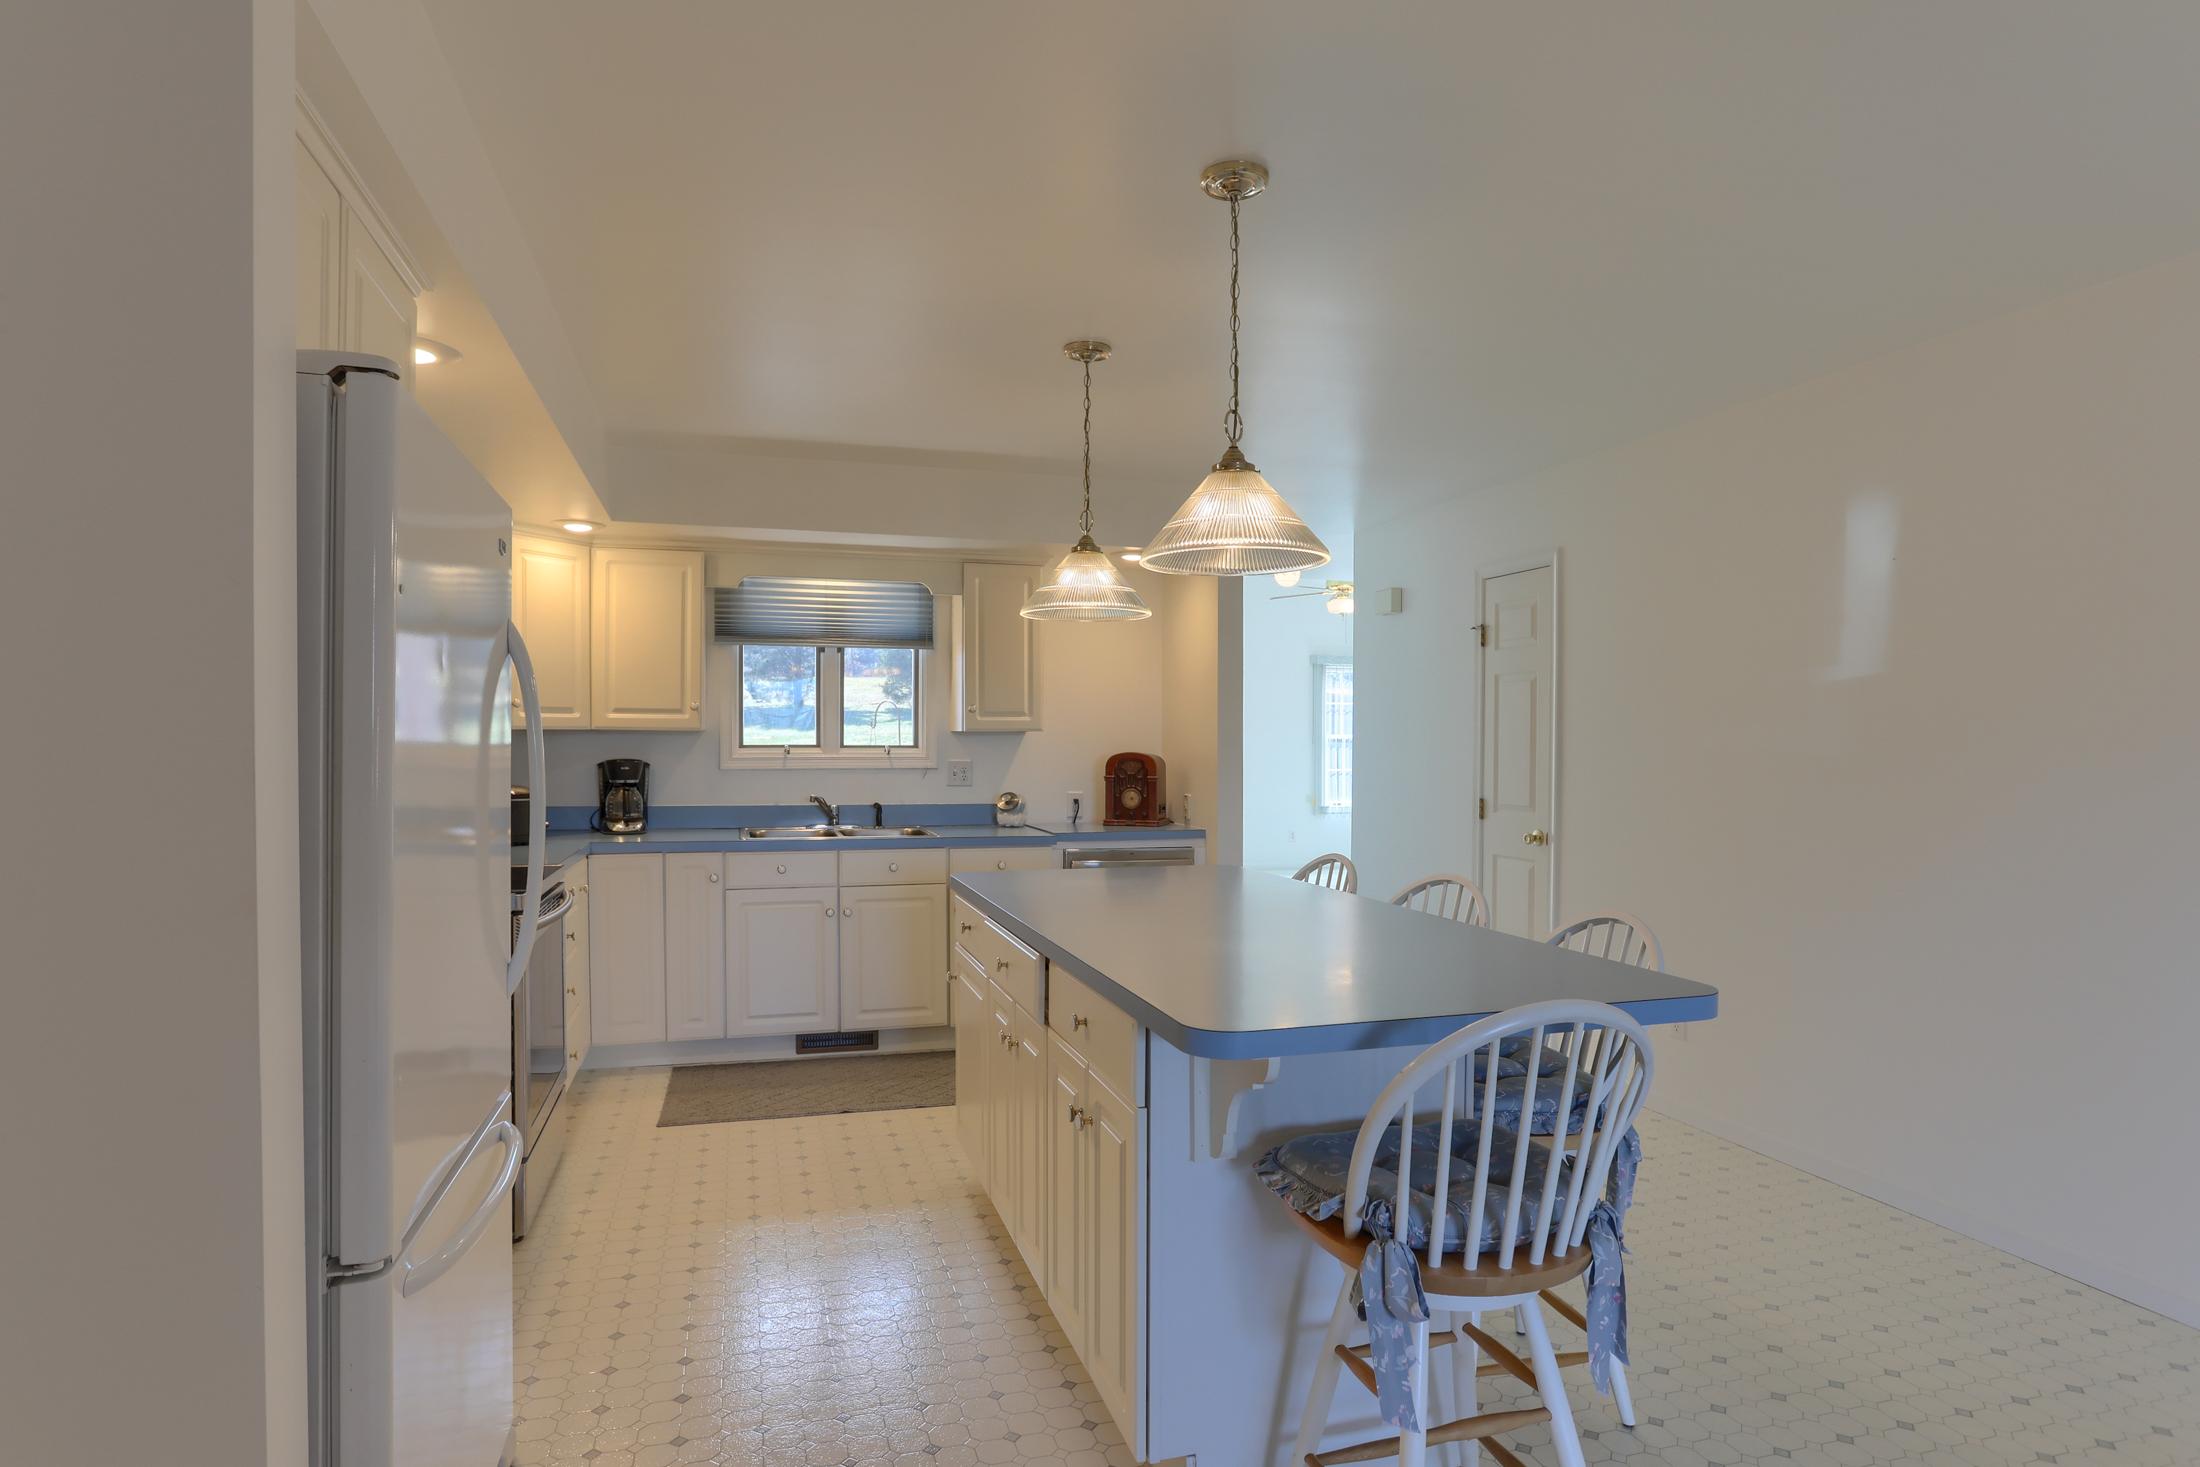 26 W. Strack Drive - Kitchen with Island